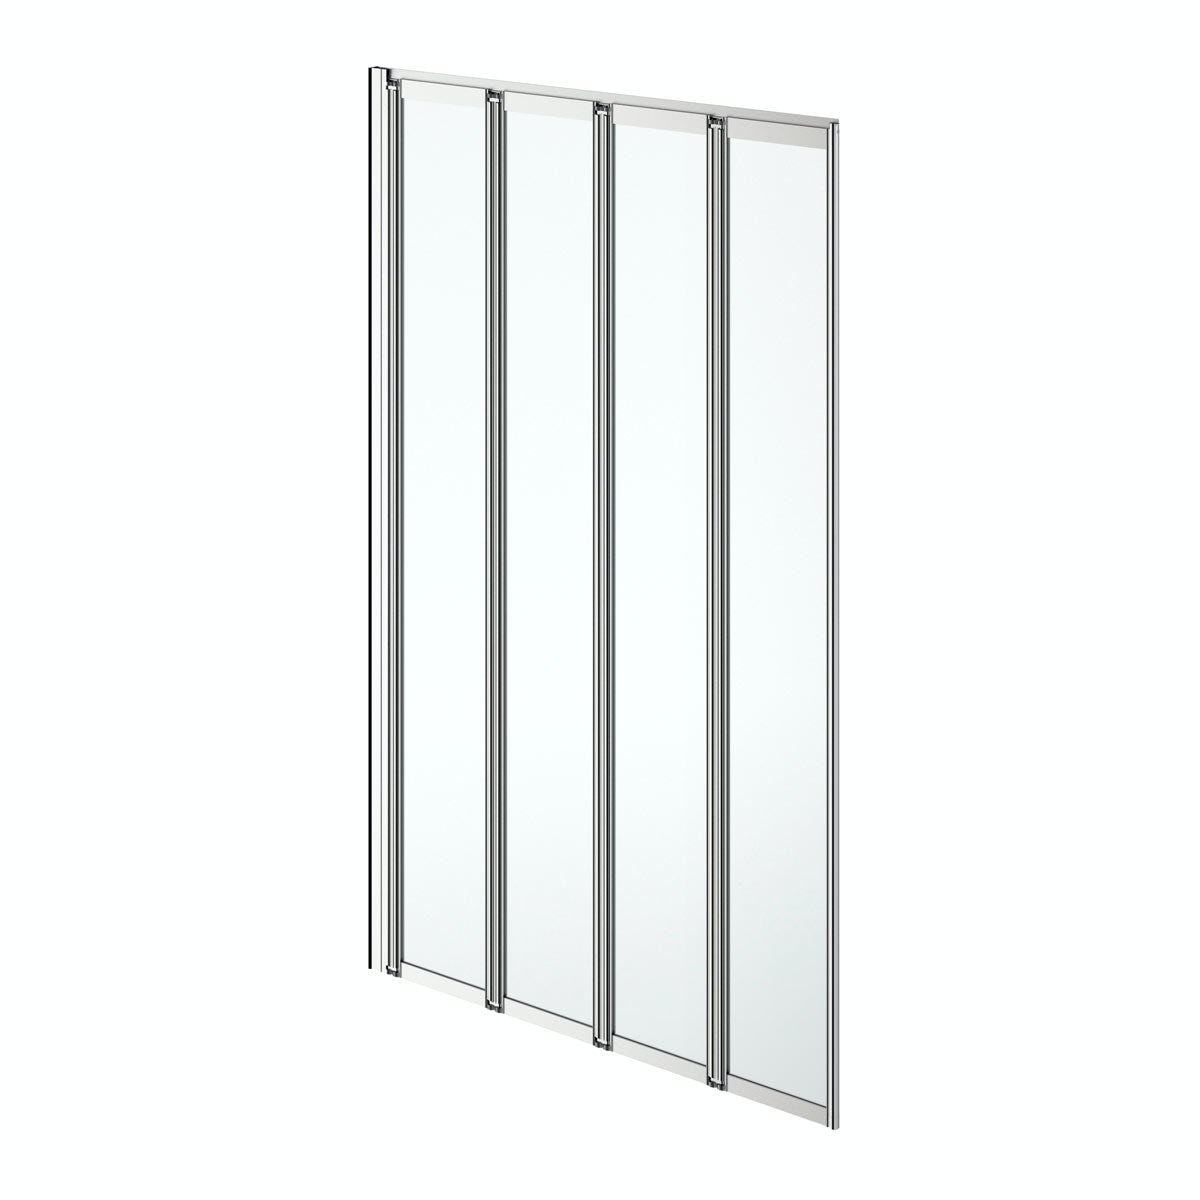 Clarity folding 4 panel straight shower bath screen silver